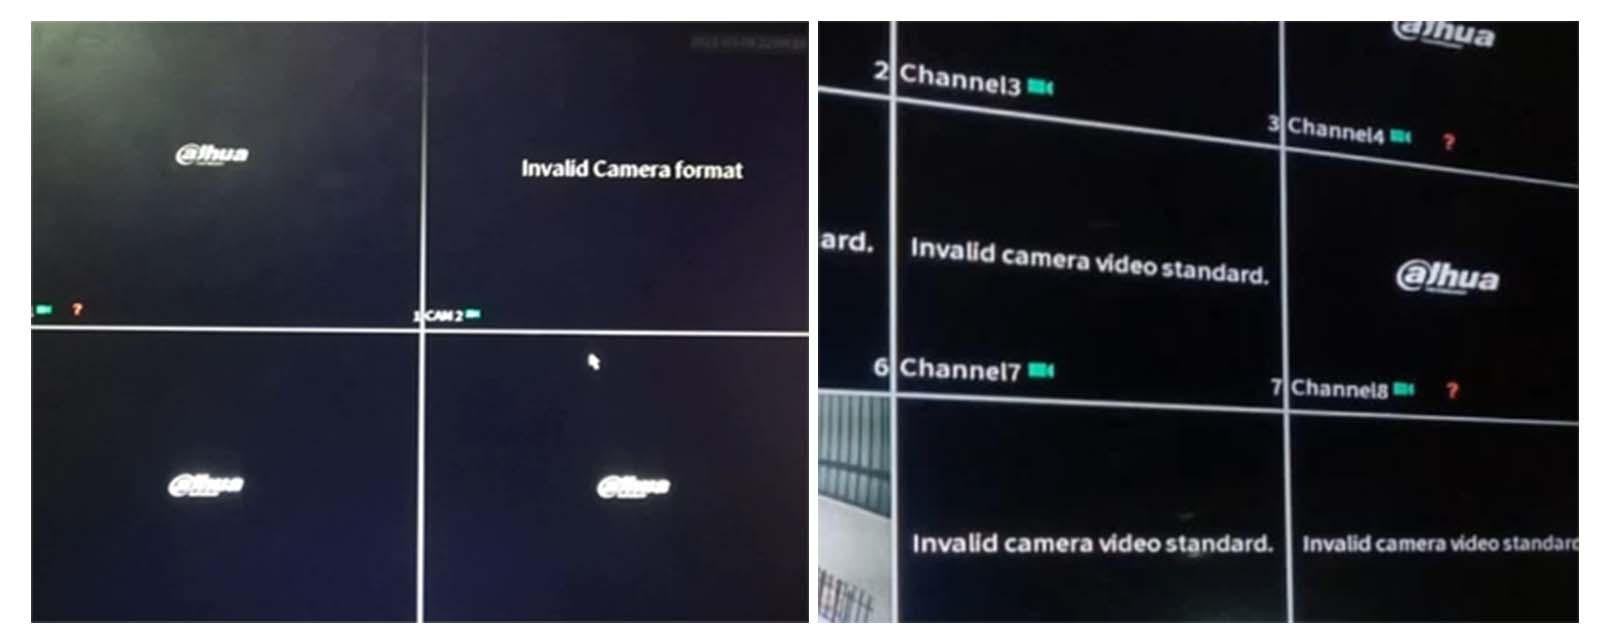 Dahua Invalid Camera Format